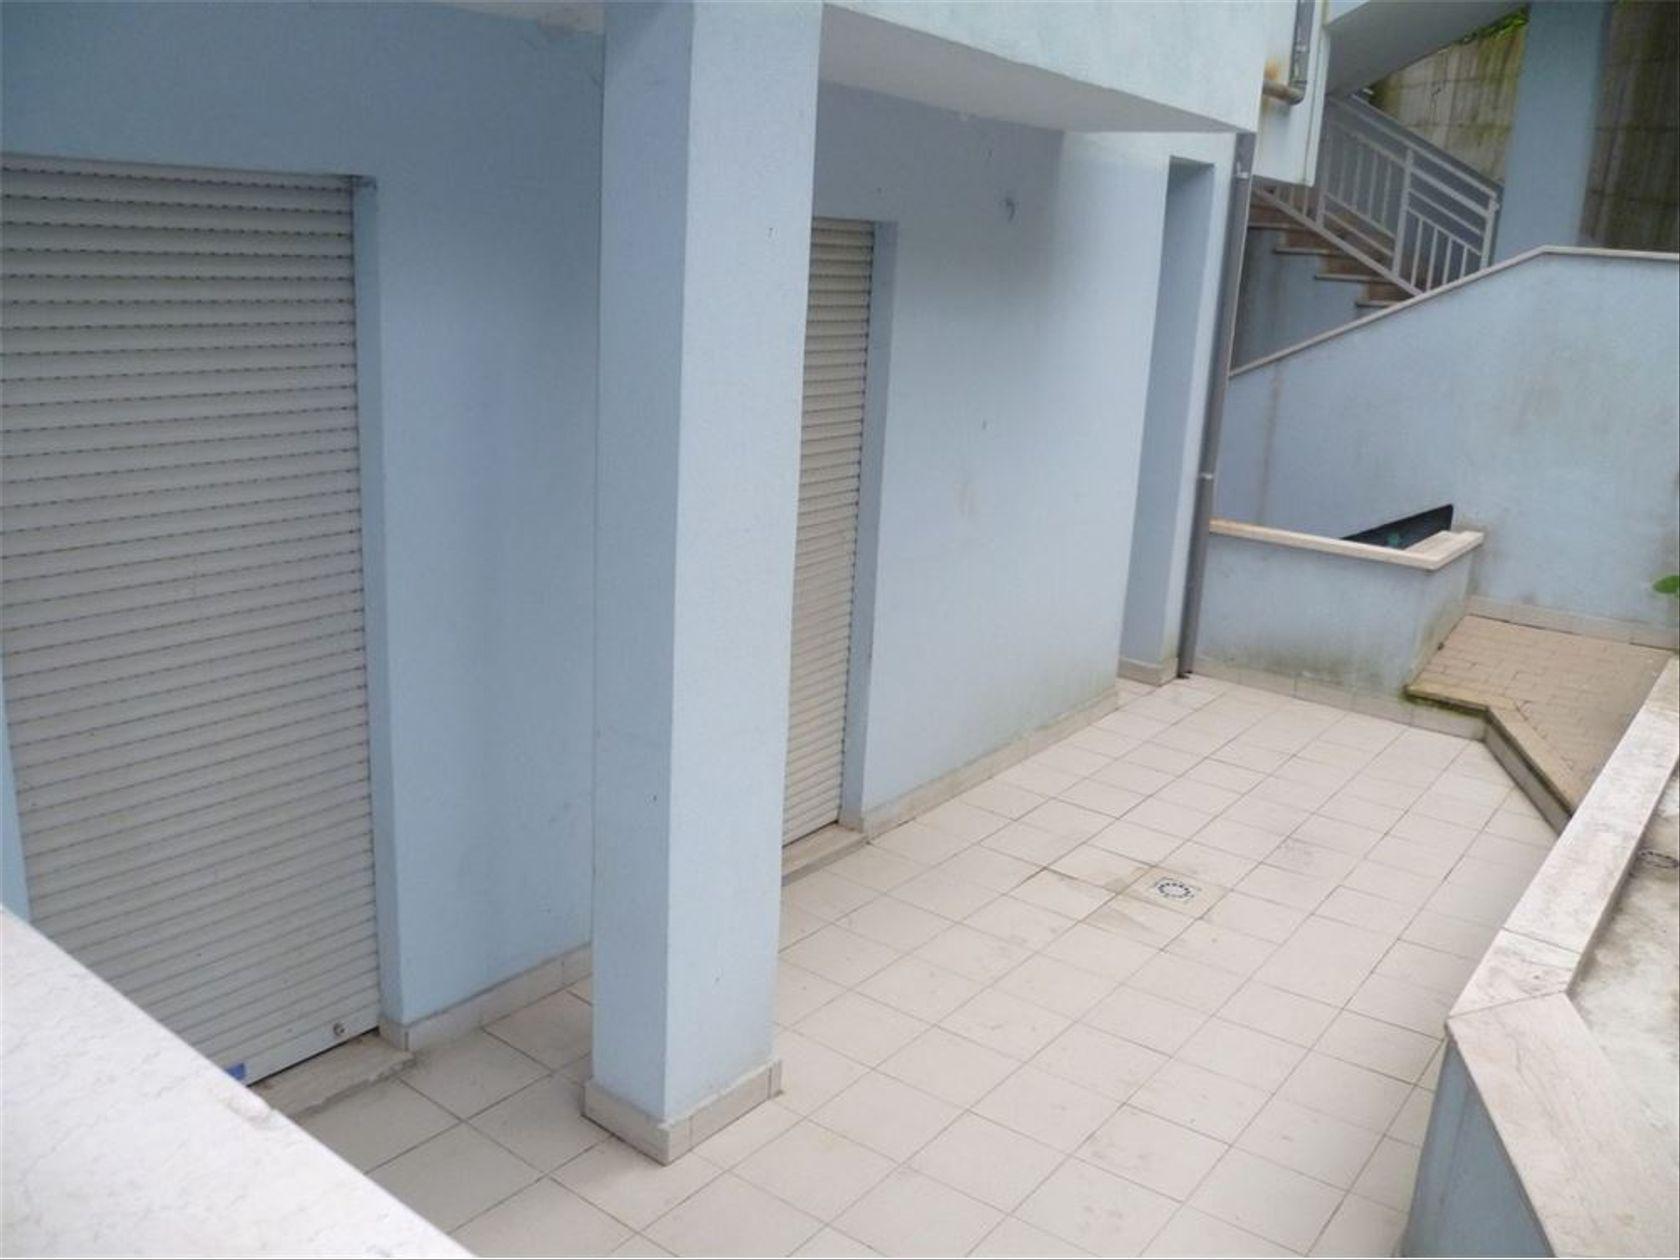 Appartamento Fossacesia Marina, Fossacesia, CH Vendita - Foto 10